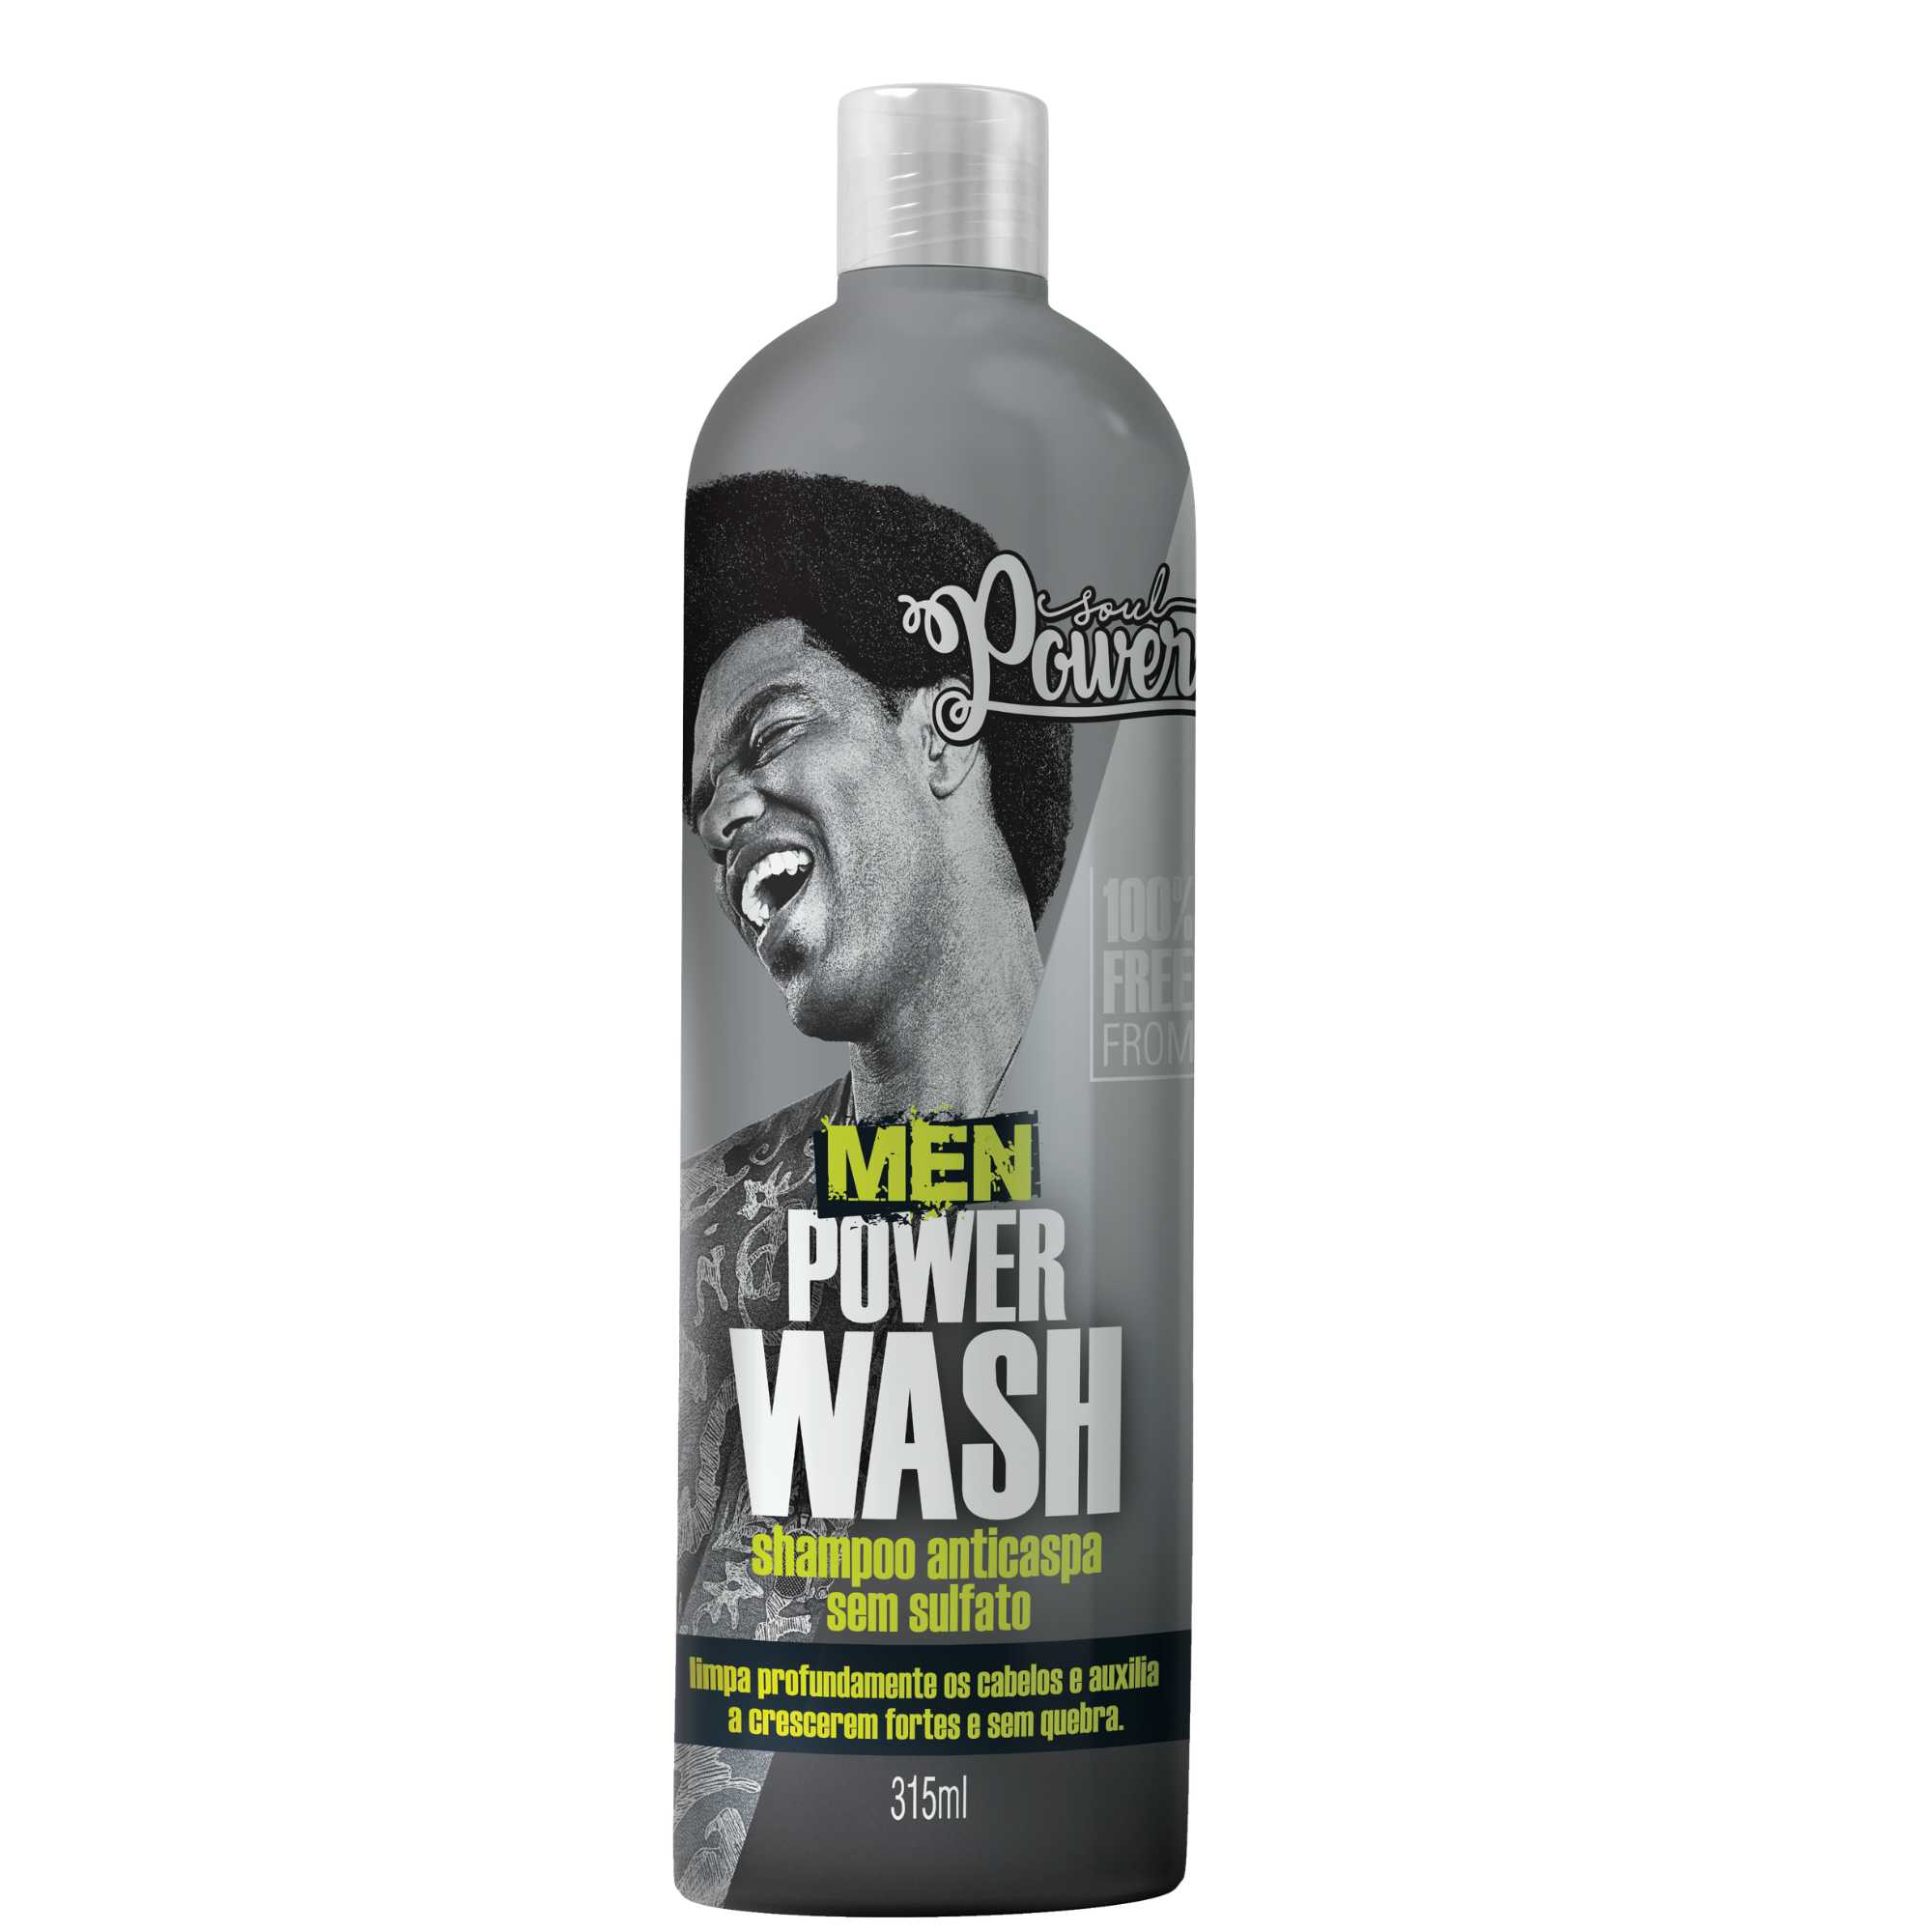 SHAMPOO MEN POWER WASH - SOUL POWER 315ML